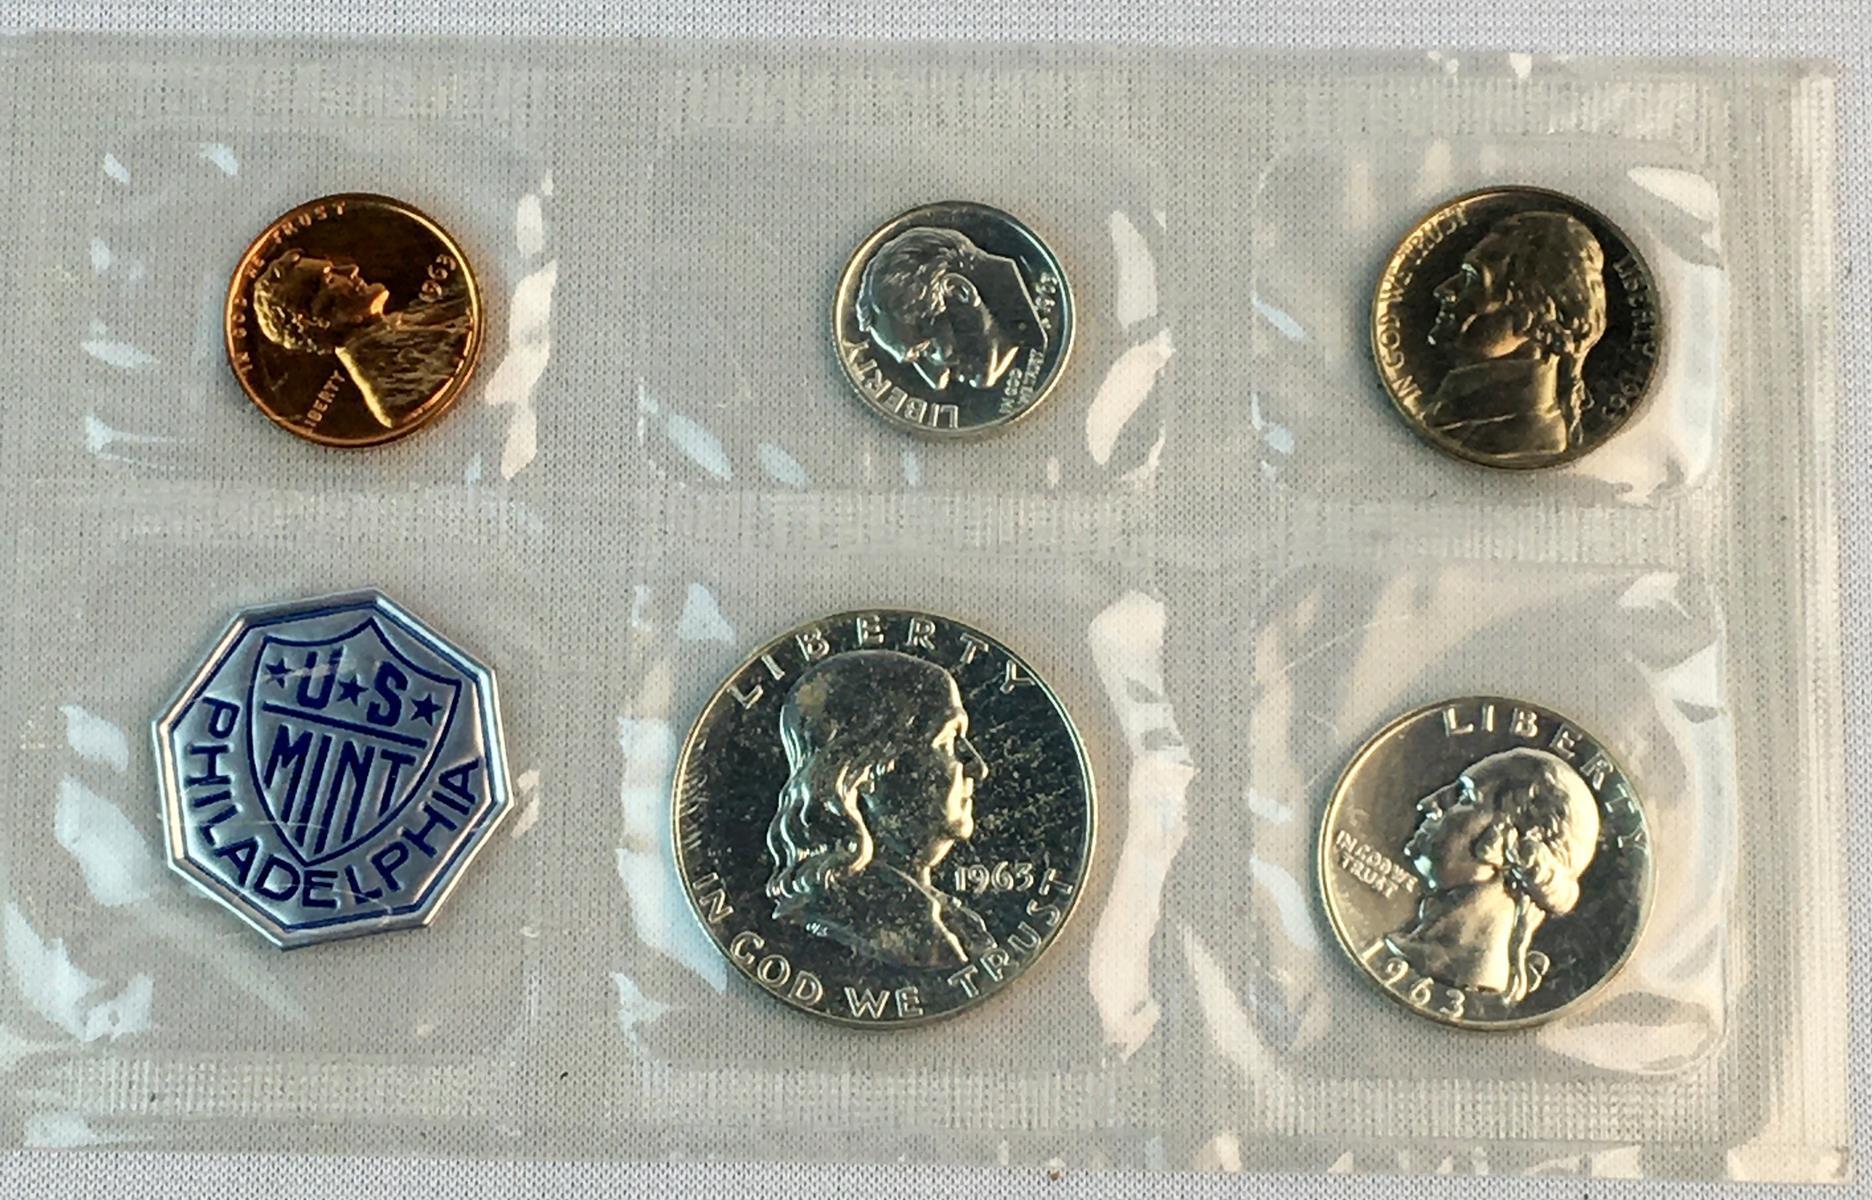 1963 US Philadelphia Mint Silver Proof 5 Coin Set In Original Packaging